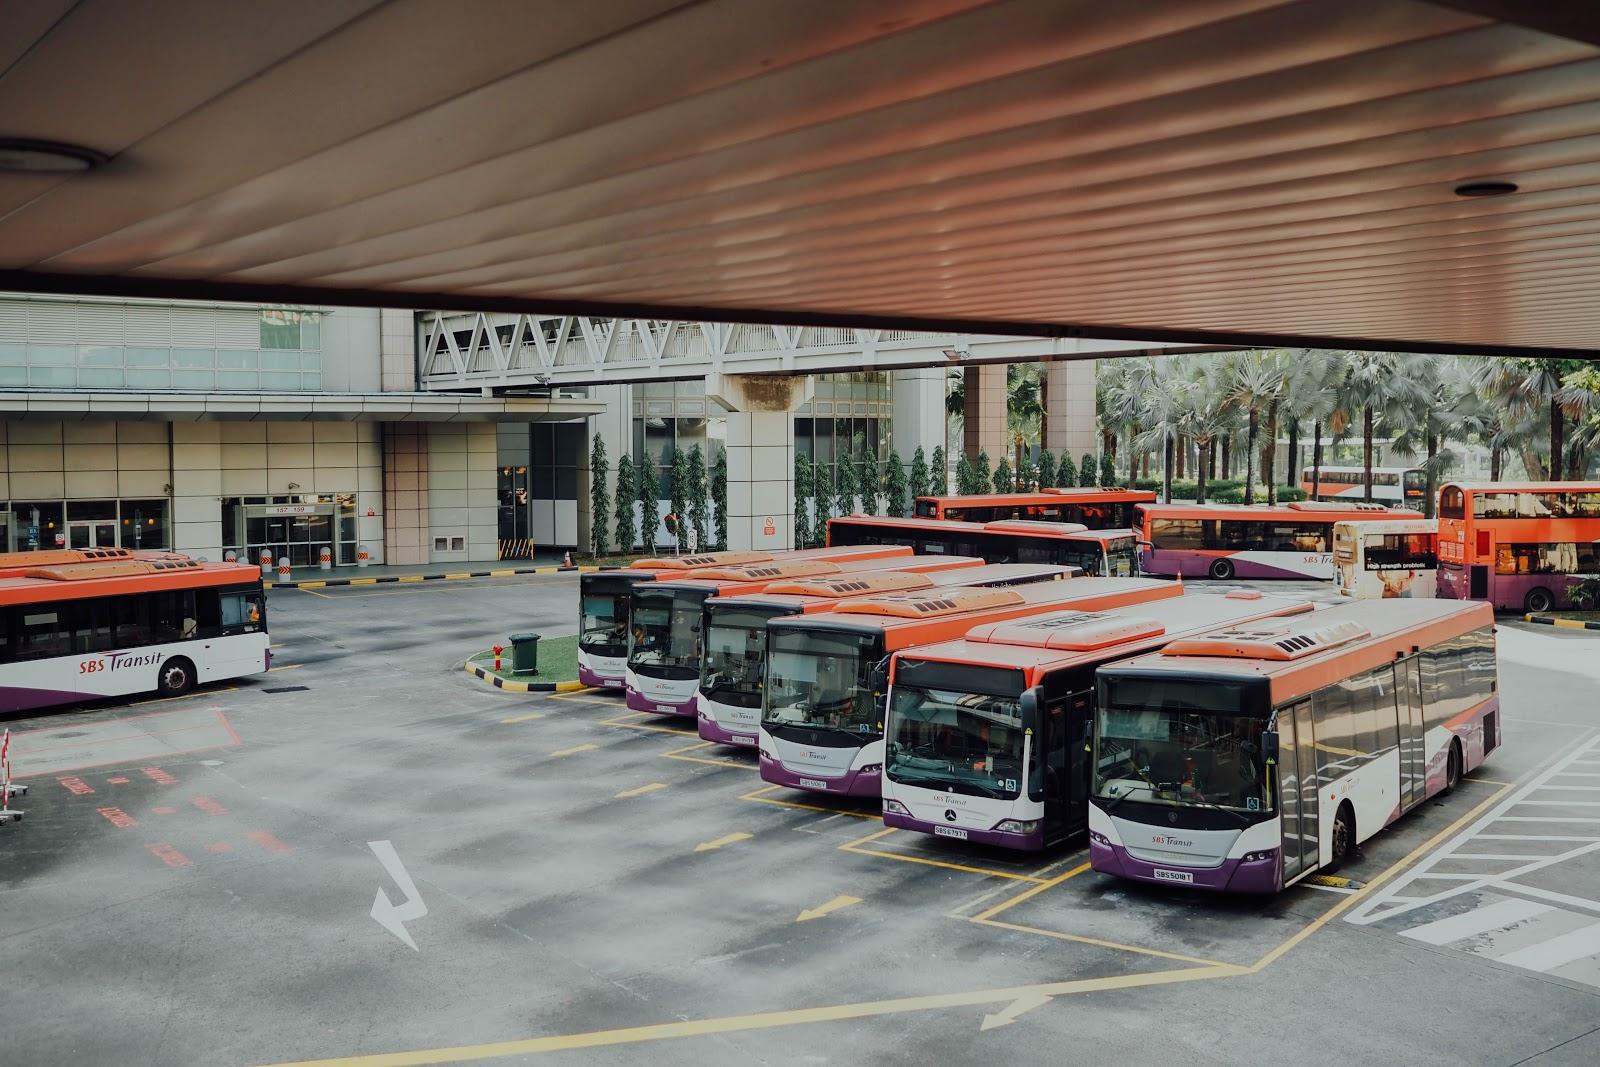 Transit company photo